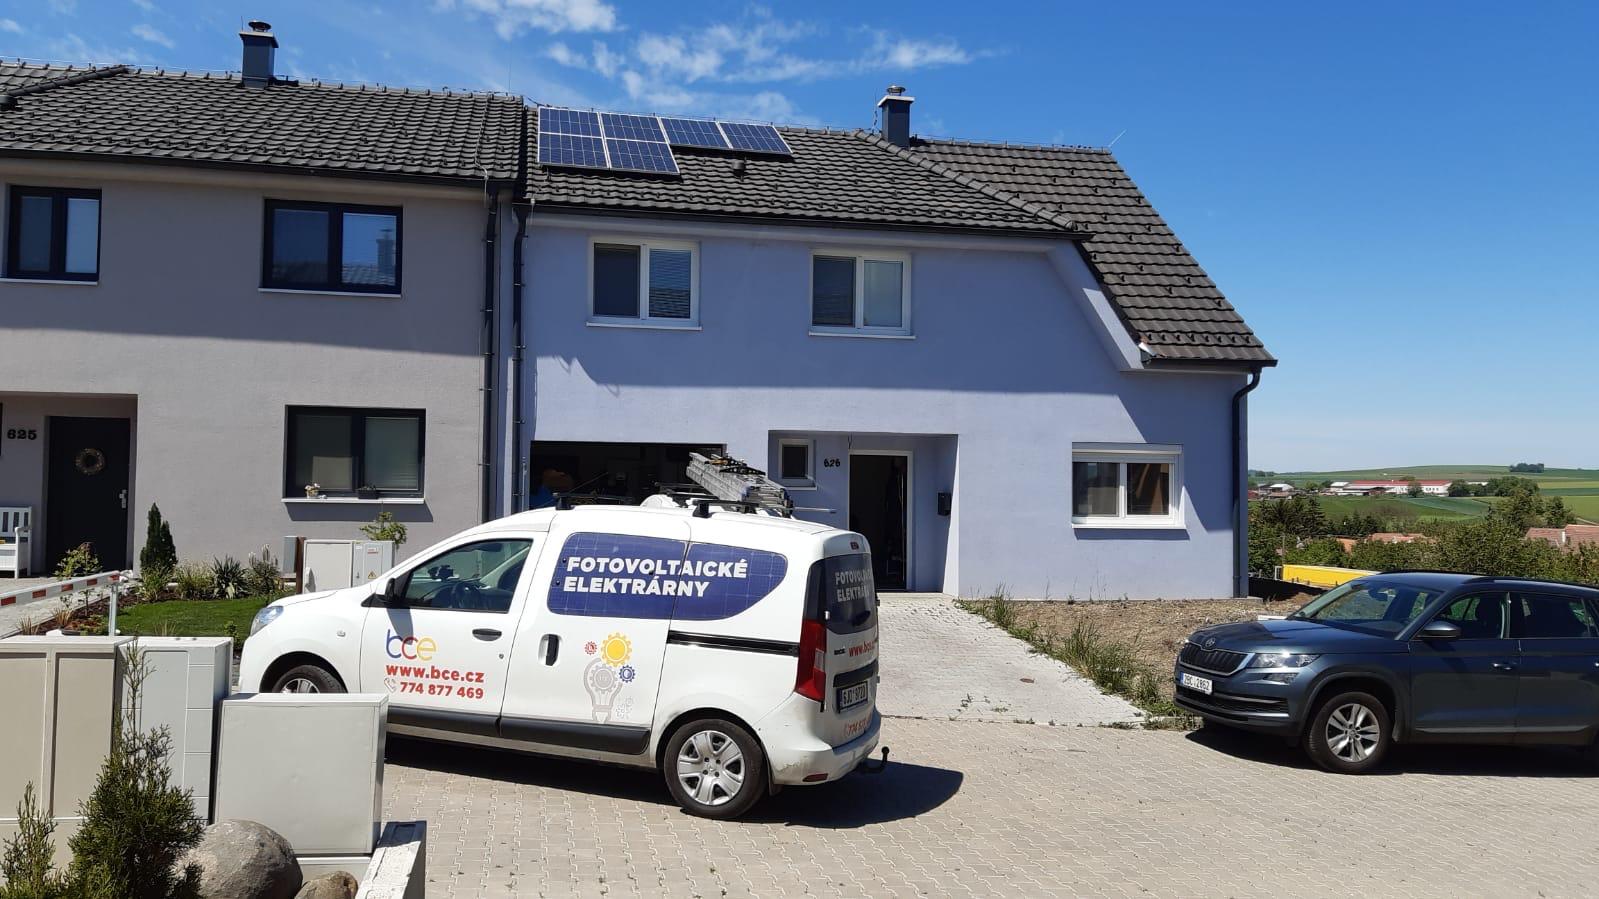 Montáž fotovoltaické elektrárny 4,38 KWp, akumulace energie do baterií